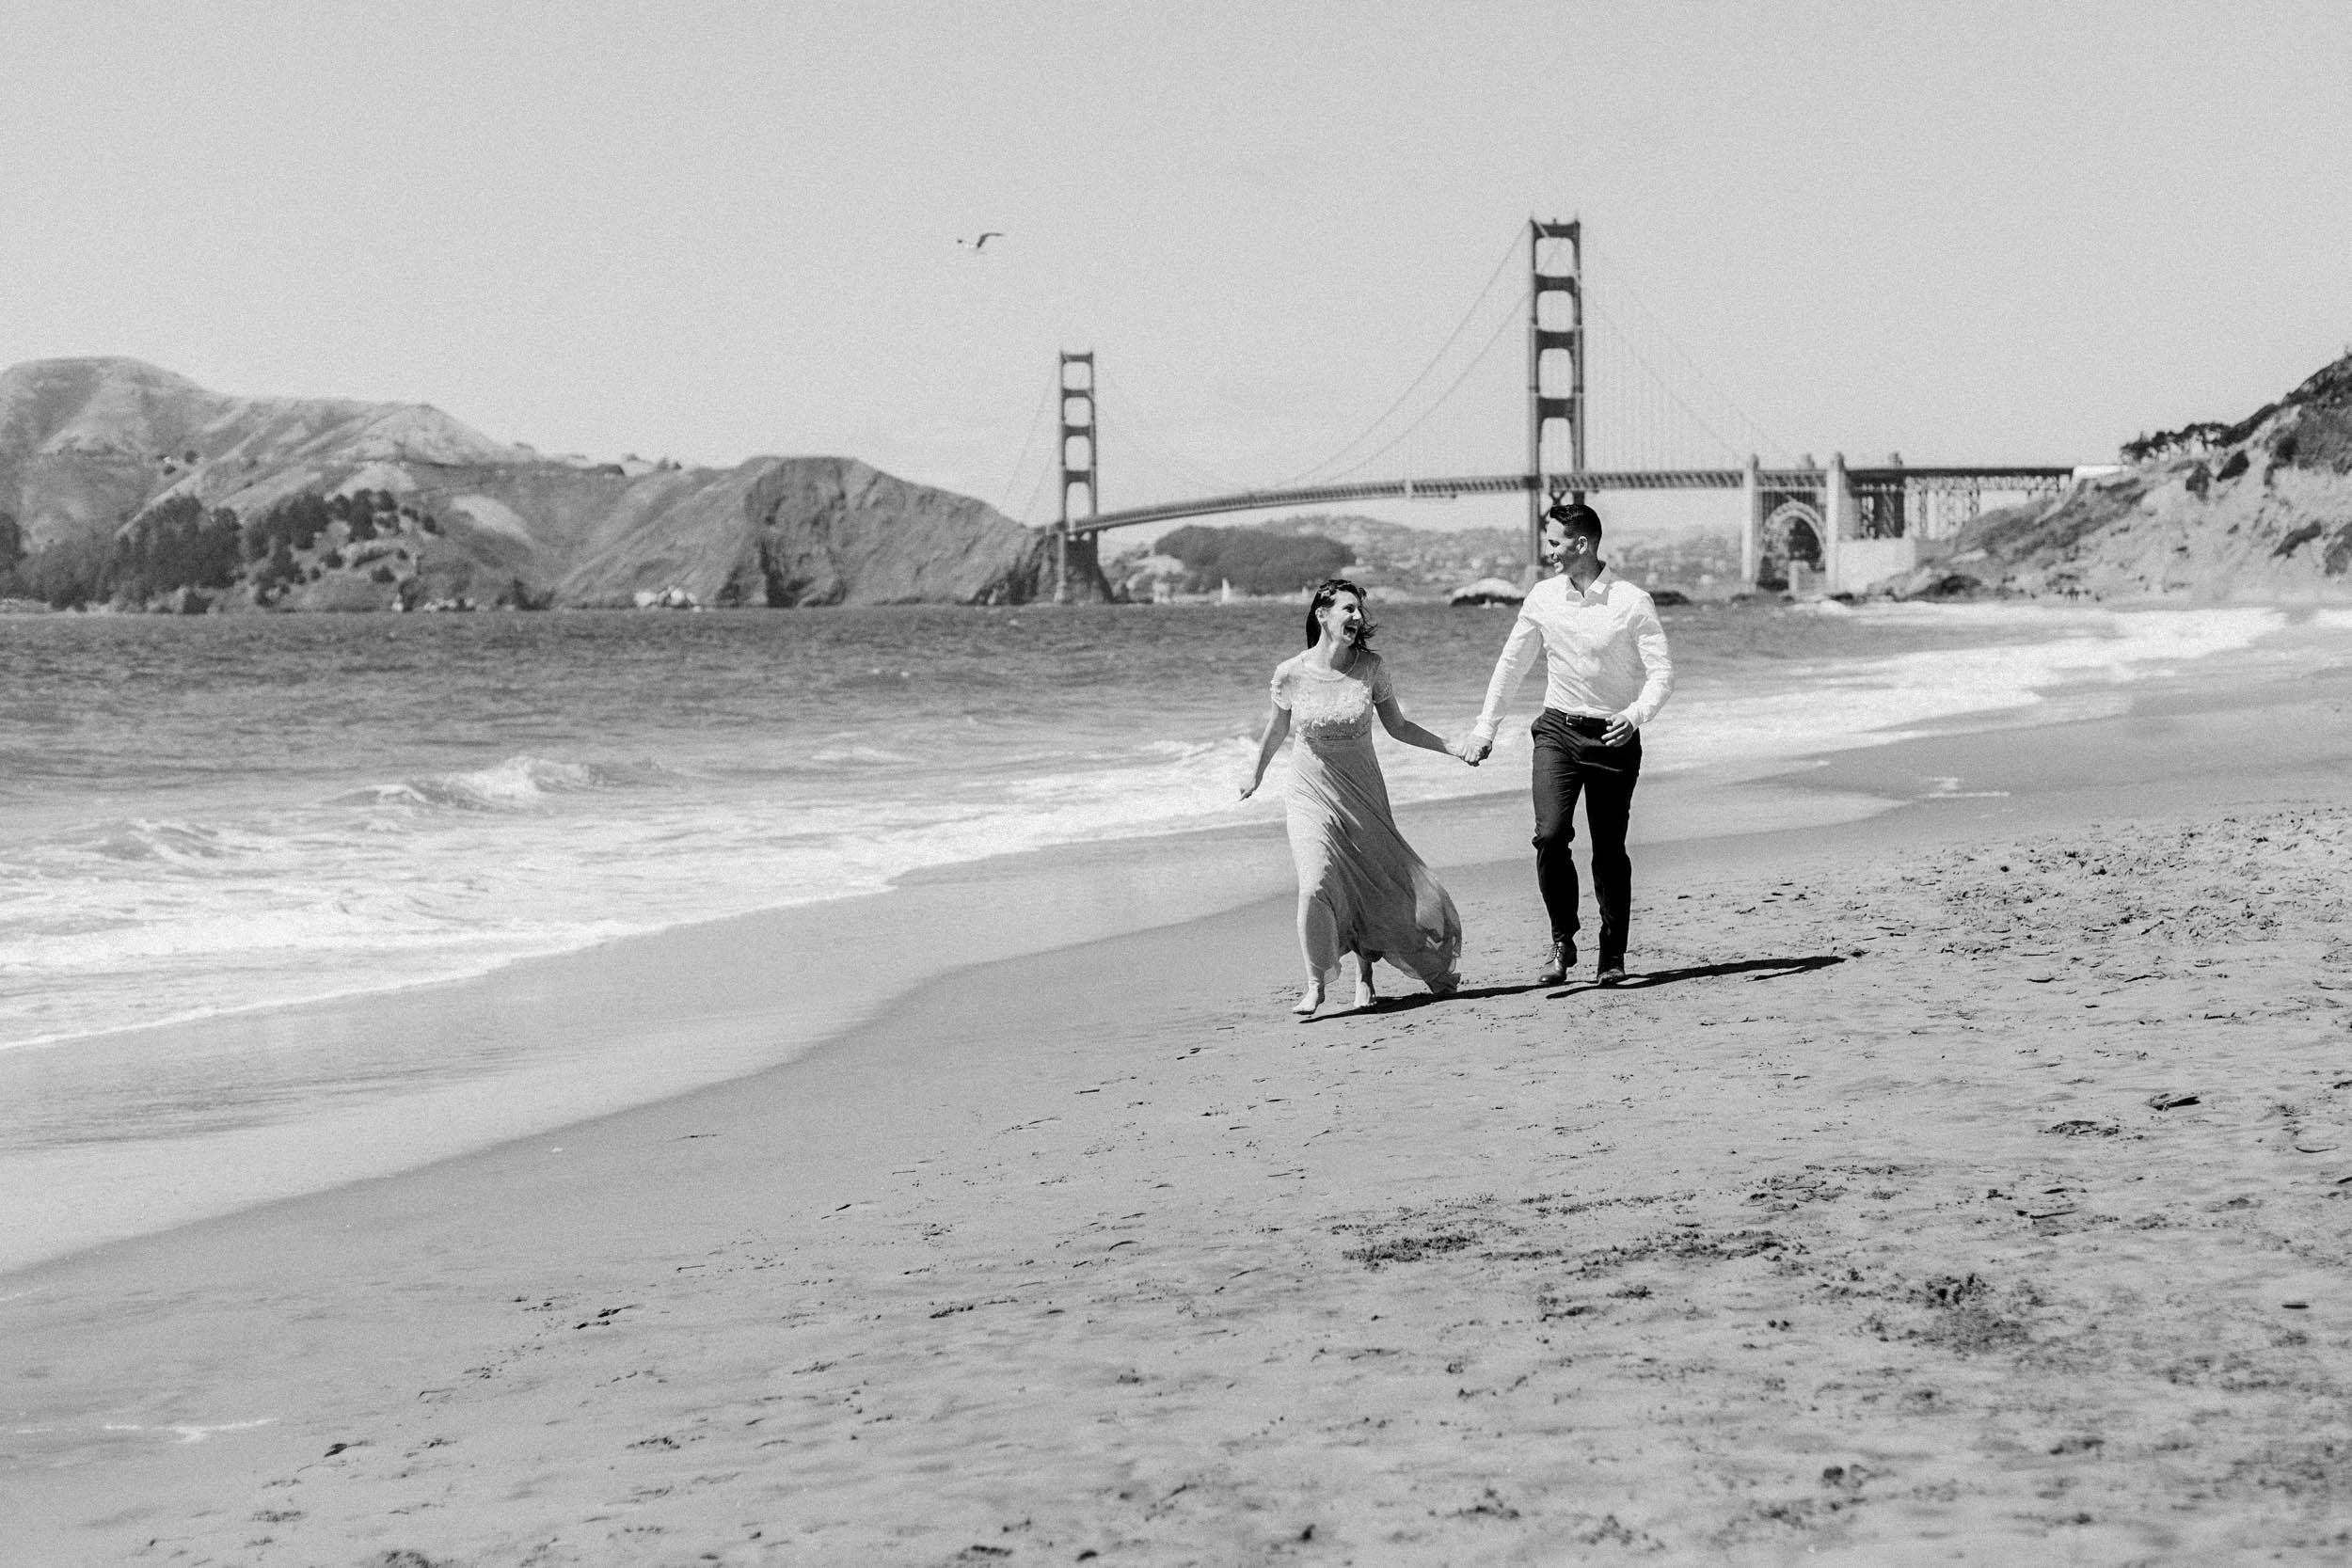 Carography-Studios-St-Augustine-Wedding-Photos-baker-beach-san-francisco-california-engagement-session-carography-stuidos-I58A0006.jpg